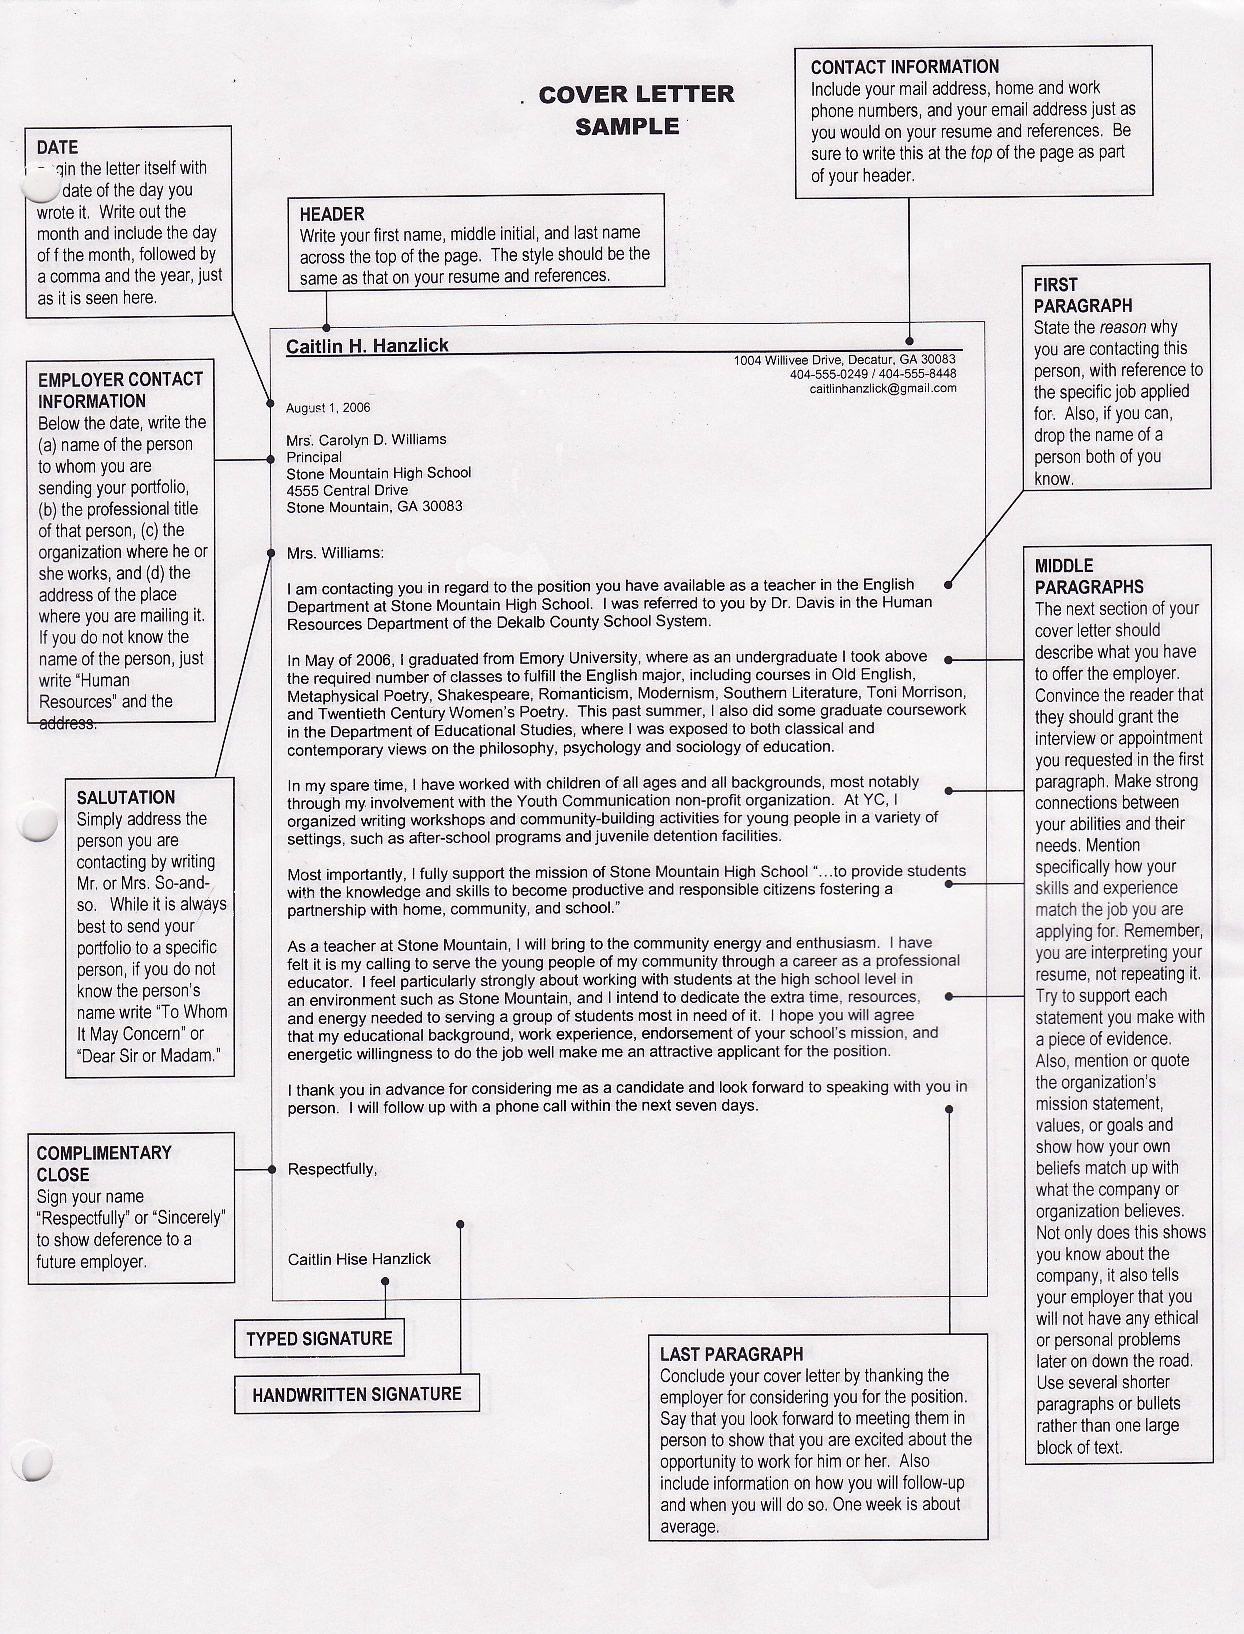 Basic Cover Letter Free Sample Federal Resume